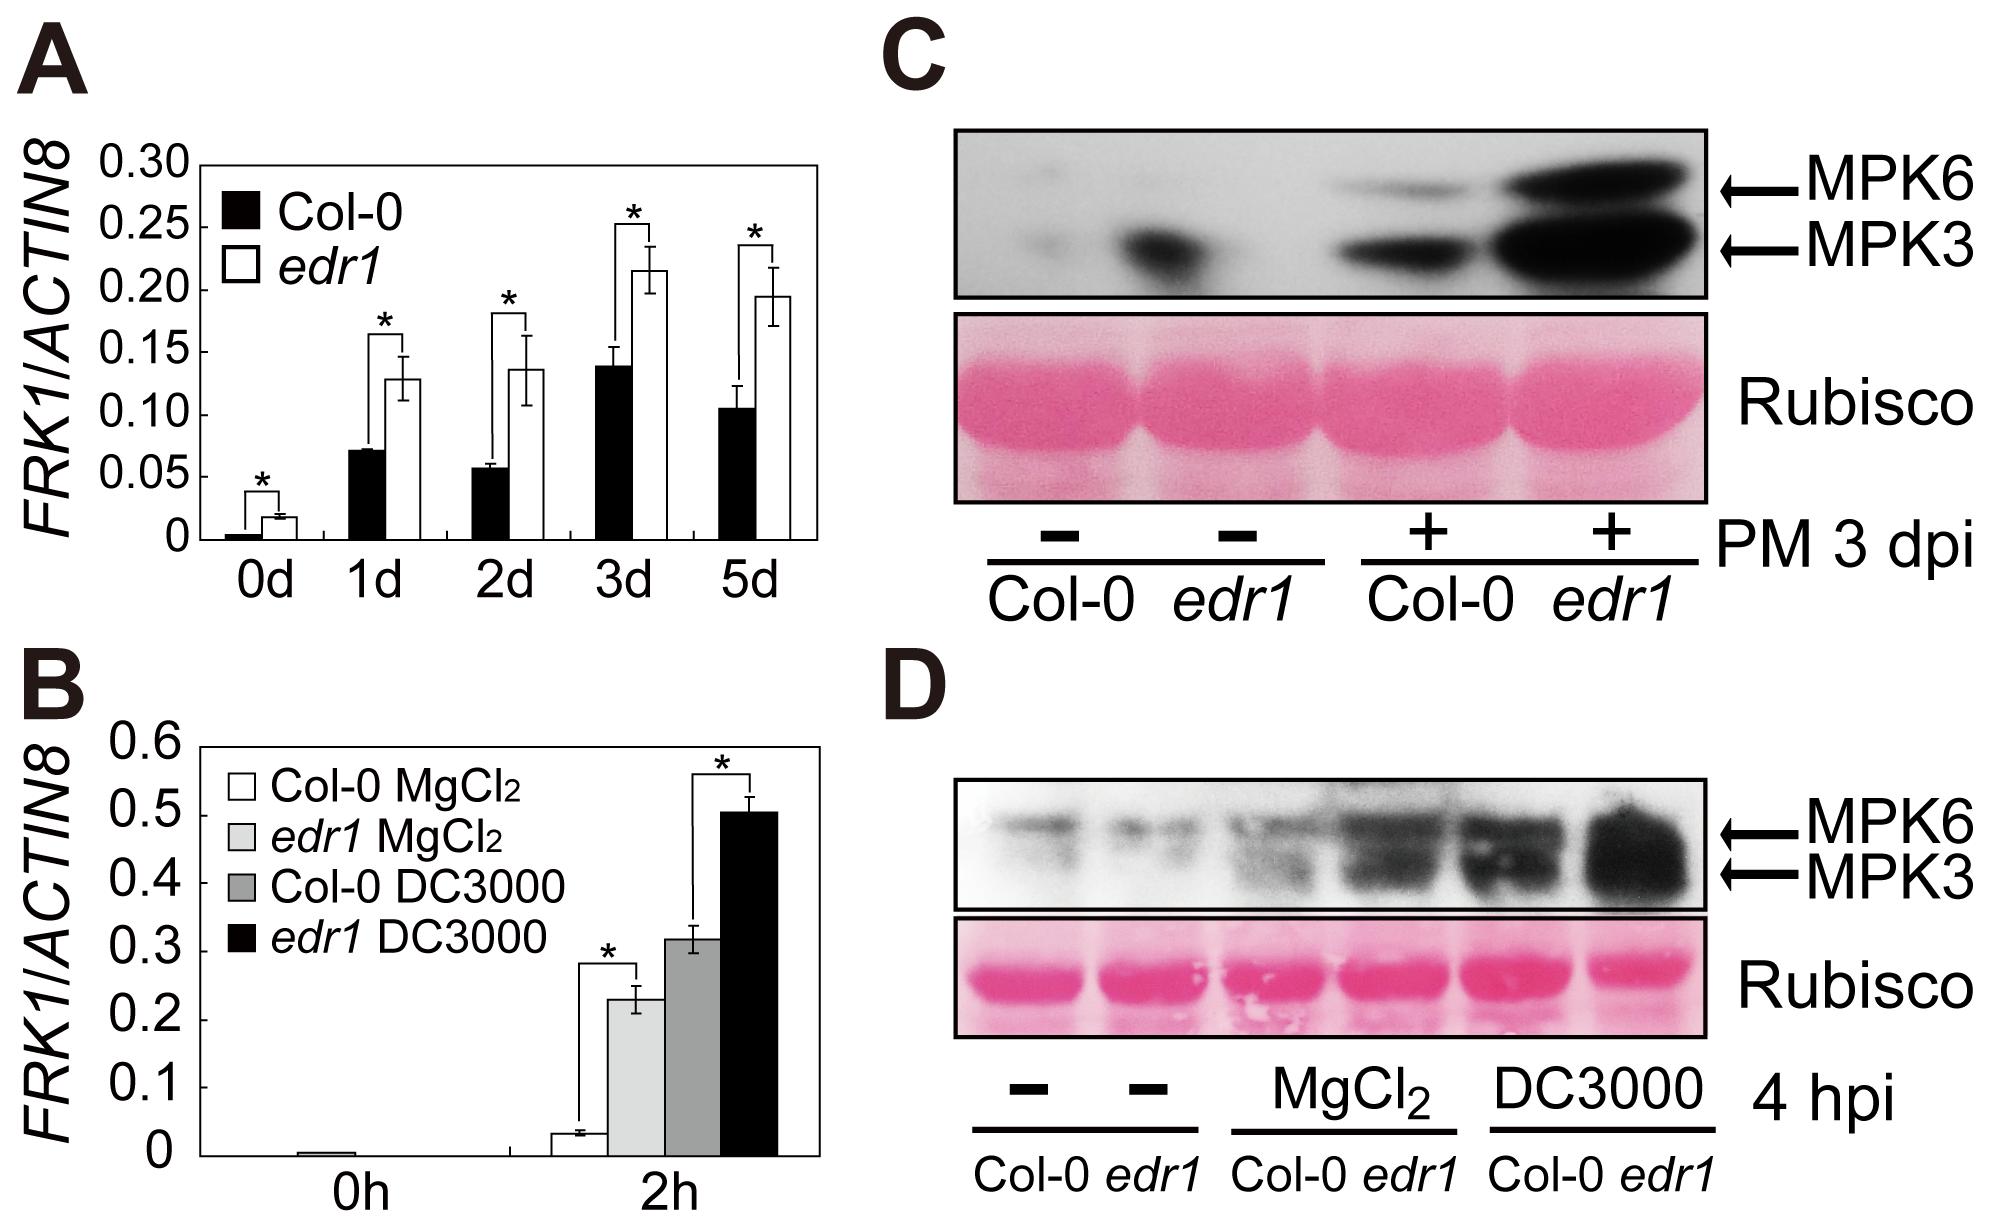 EDR1 negatively regulates the kinase activity of MPK3 and MPK6.